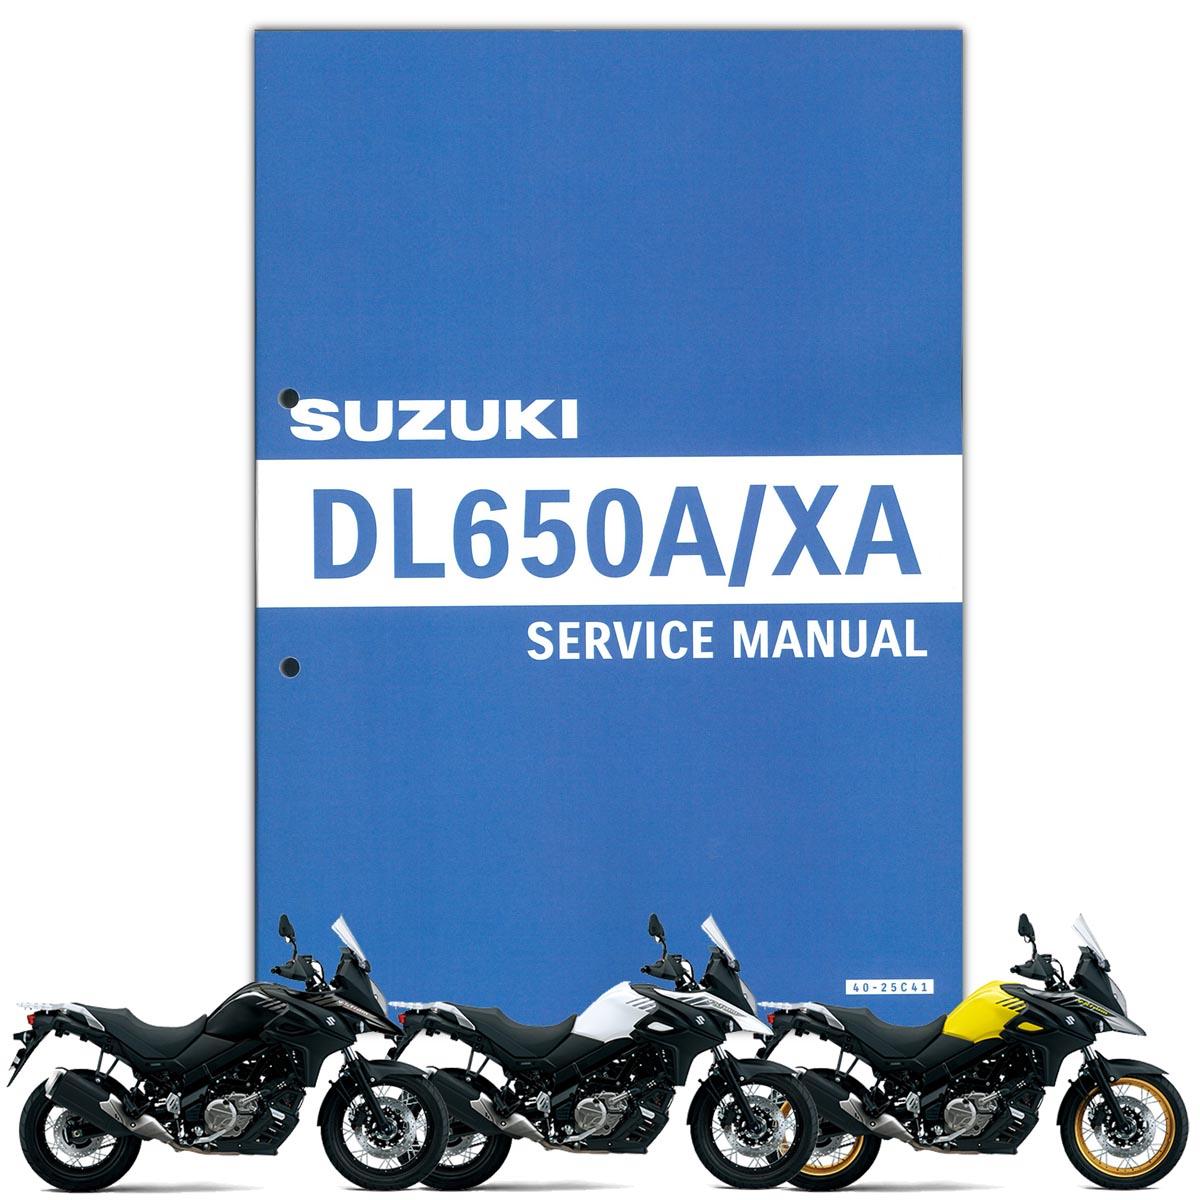 SUZUKI(スズキ) V-Strom650 ('17-'18) サービスマニュアル(S0040-25C41)